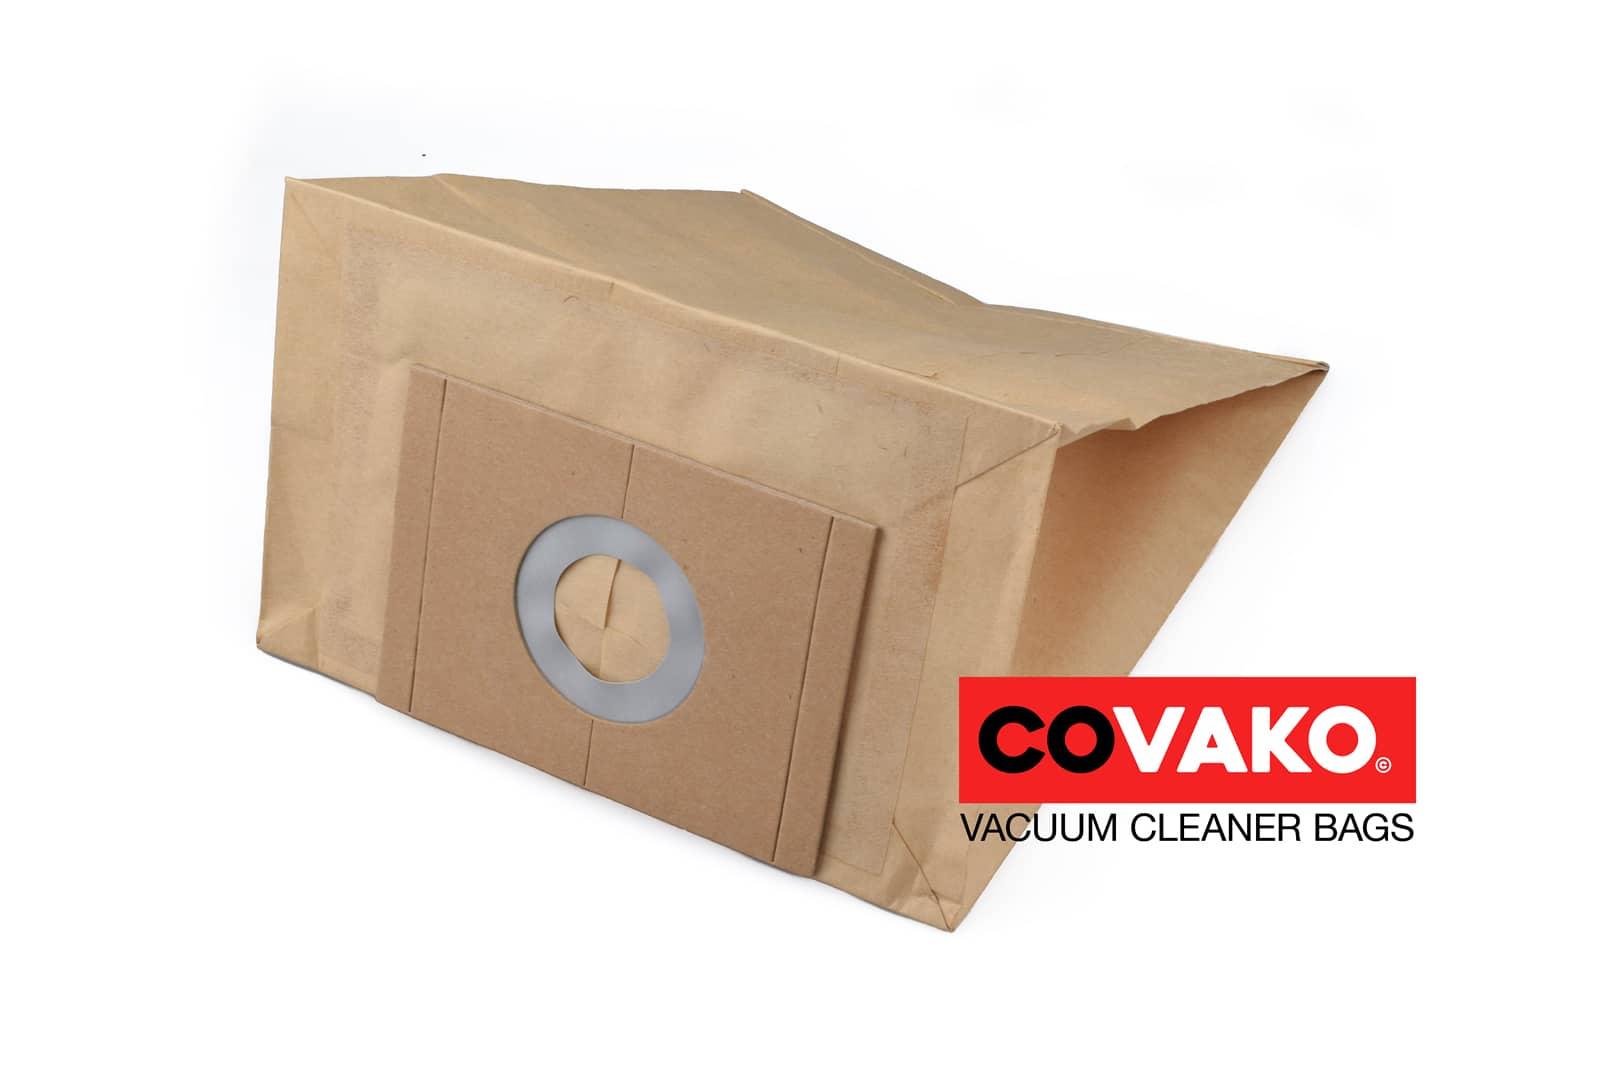 Gansow Jet T 117 / Paper - Gansow vacuum cleaner bags